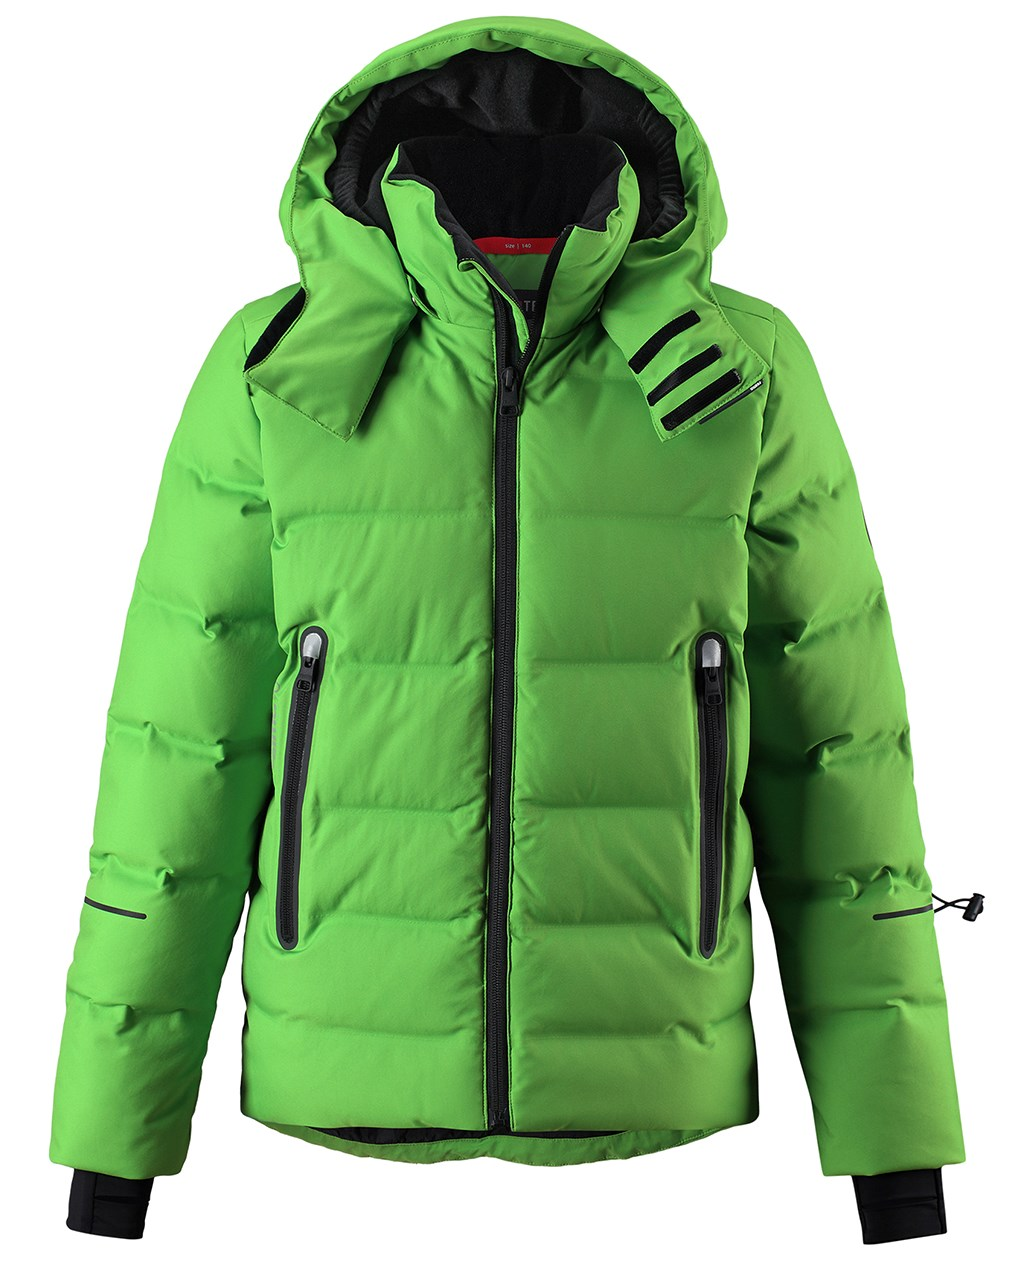 e833ad15 Wakeup Down Jacket JR Fresh Green